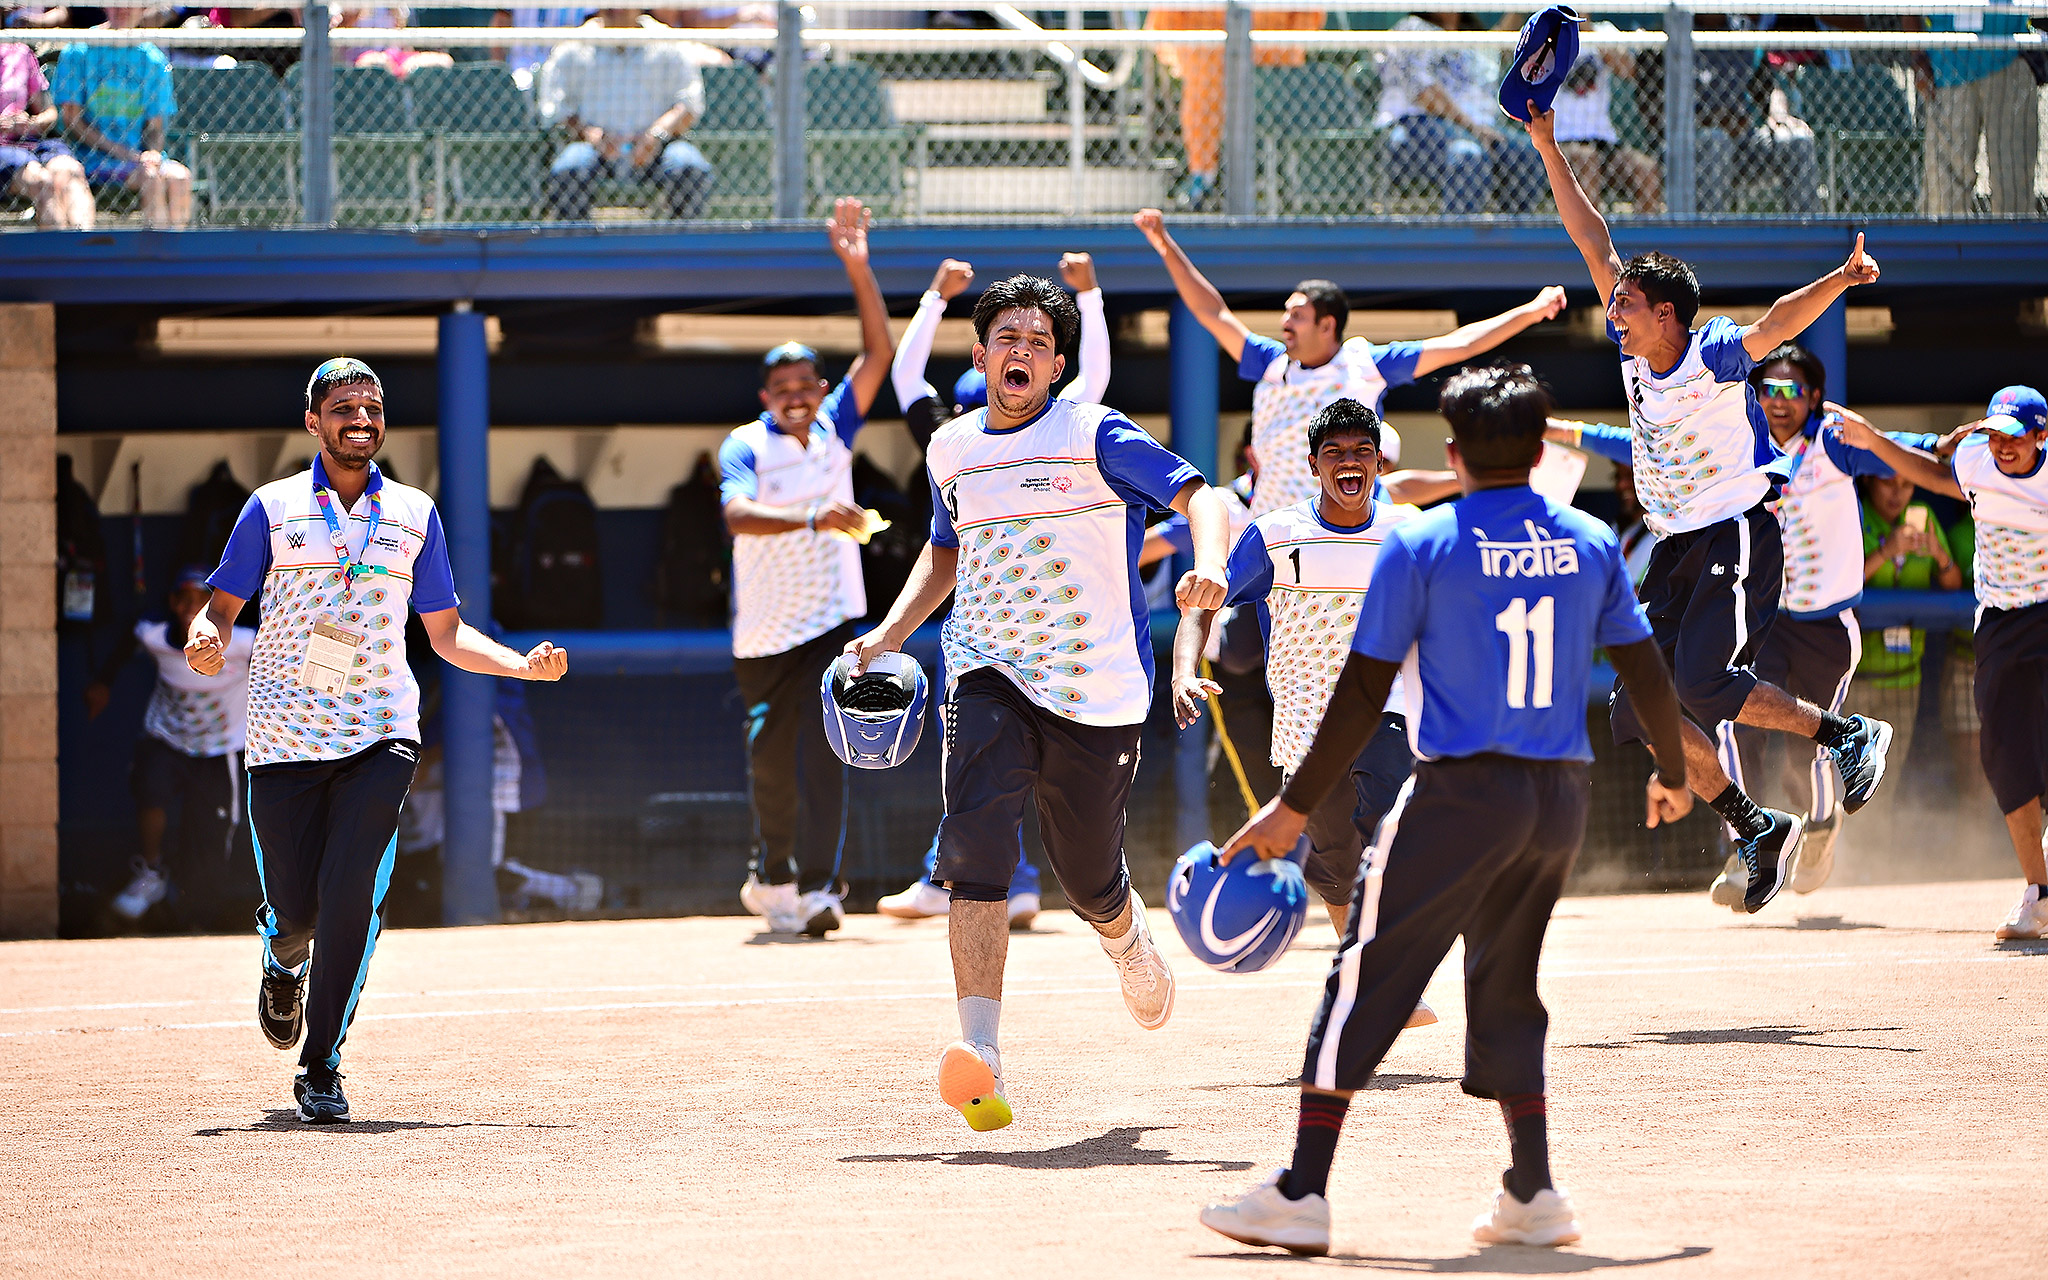 India celebrates